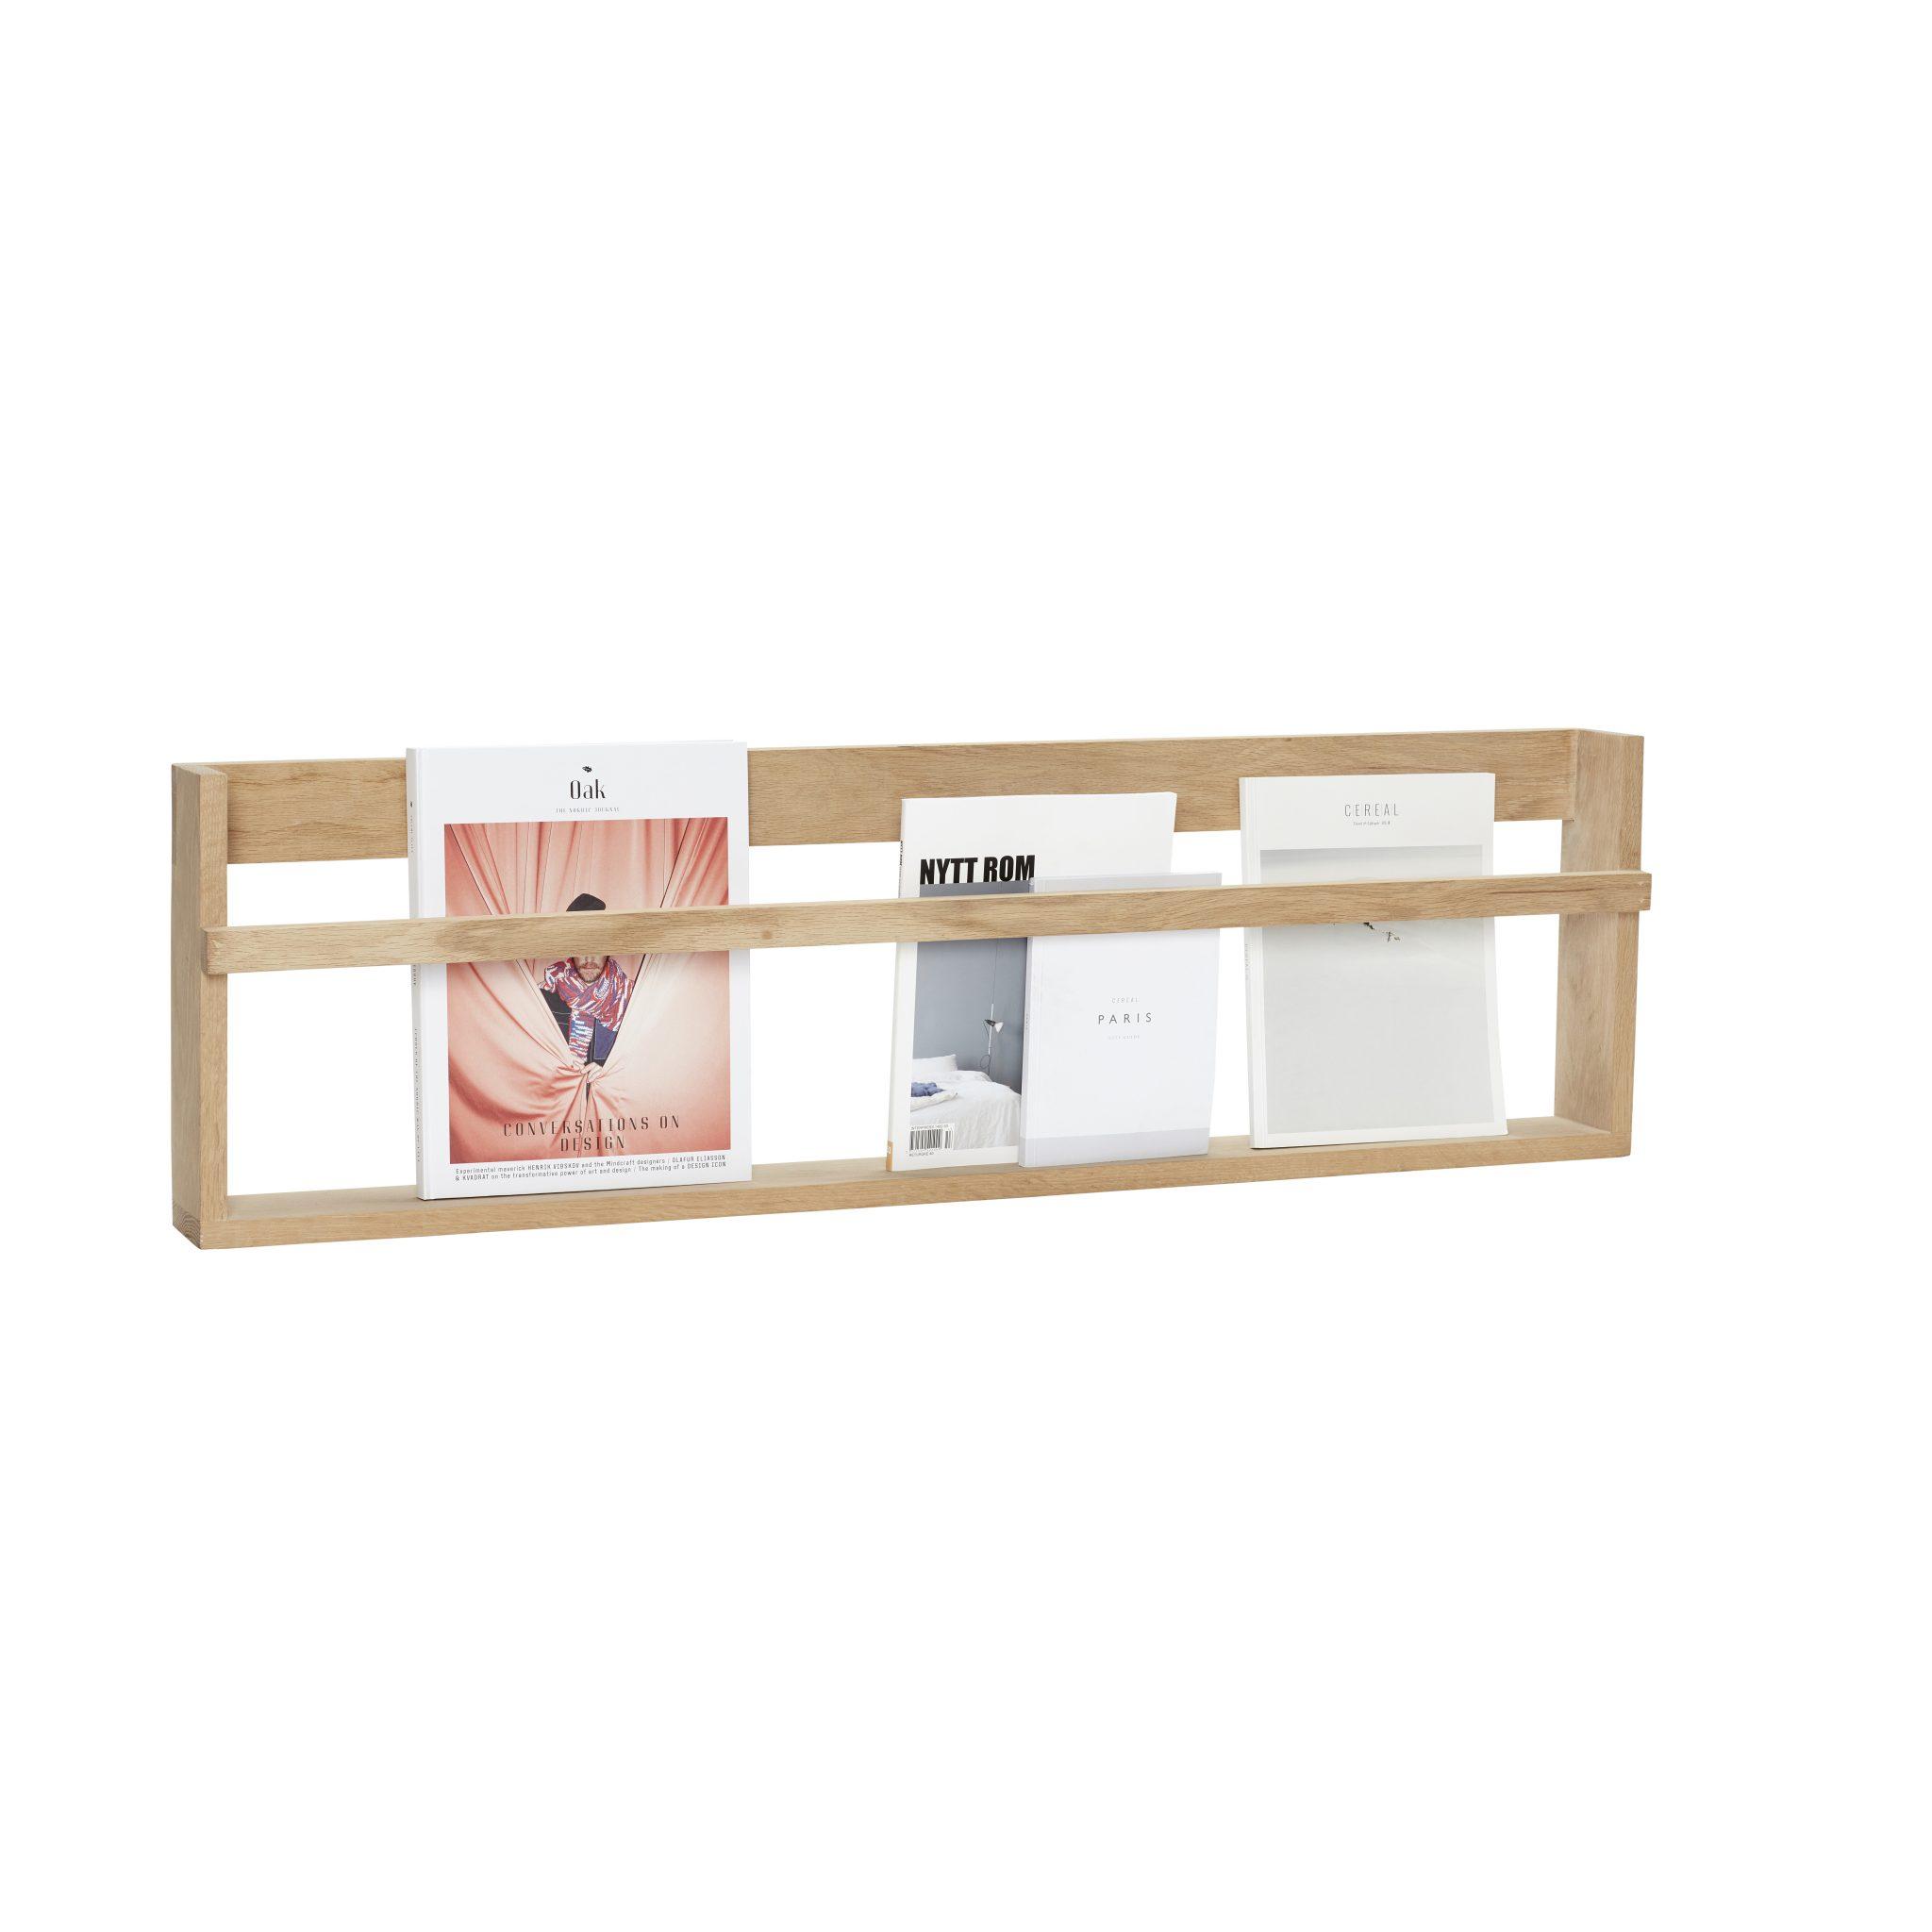 Helt nye Vegghylle i eik - Magasinholder - Palma store BQ-81